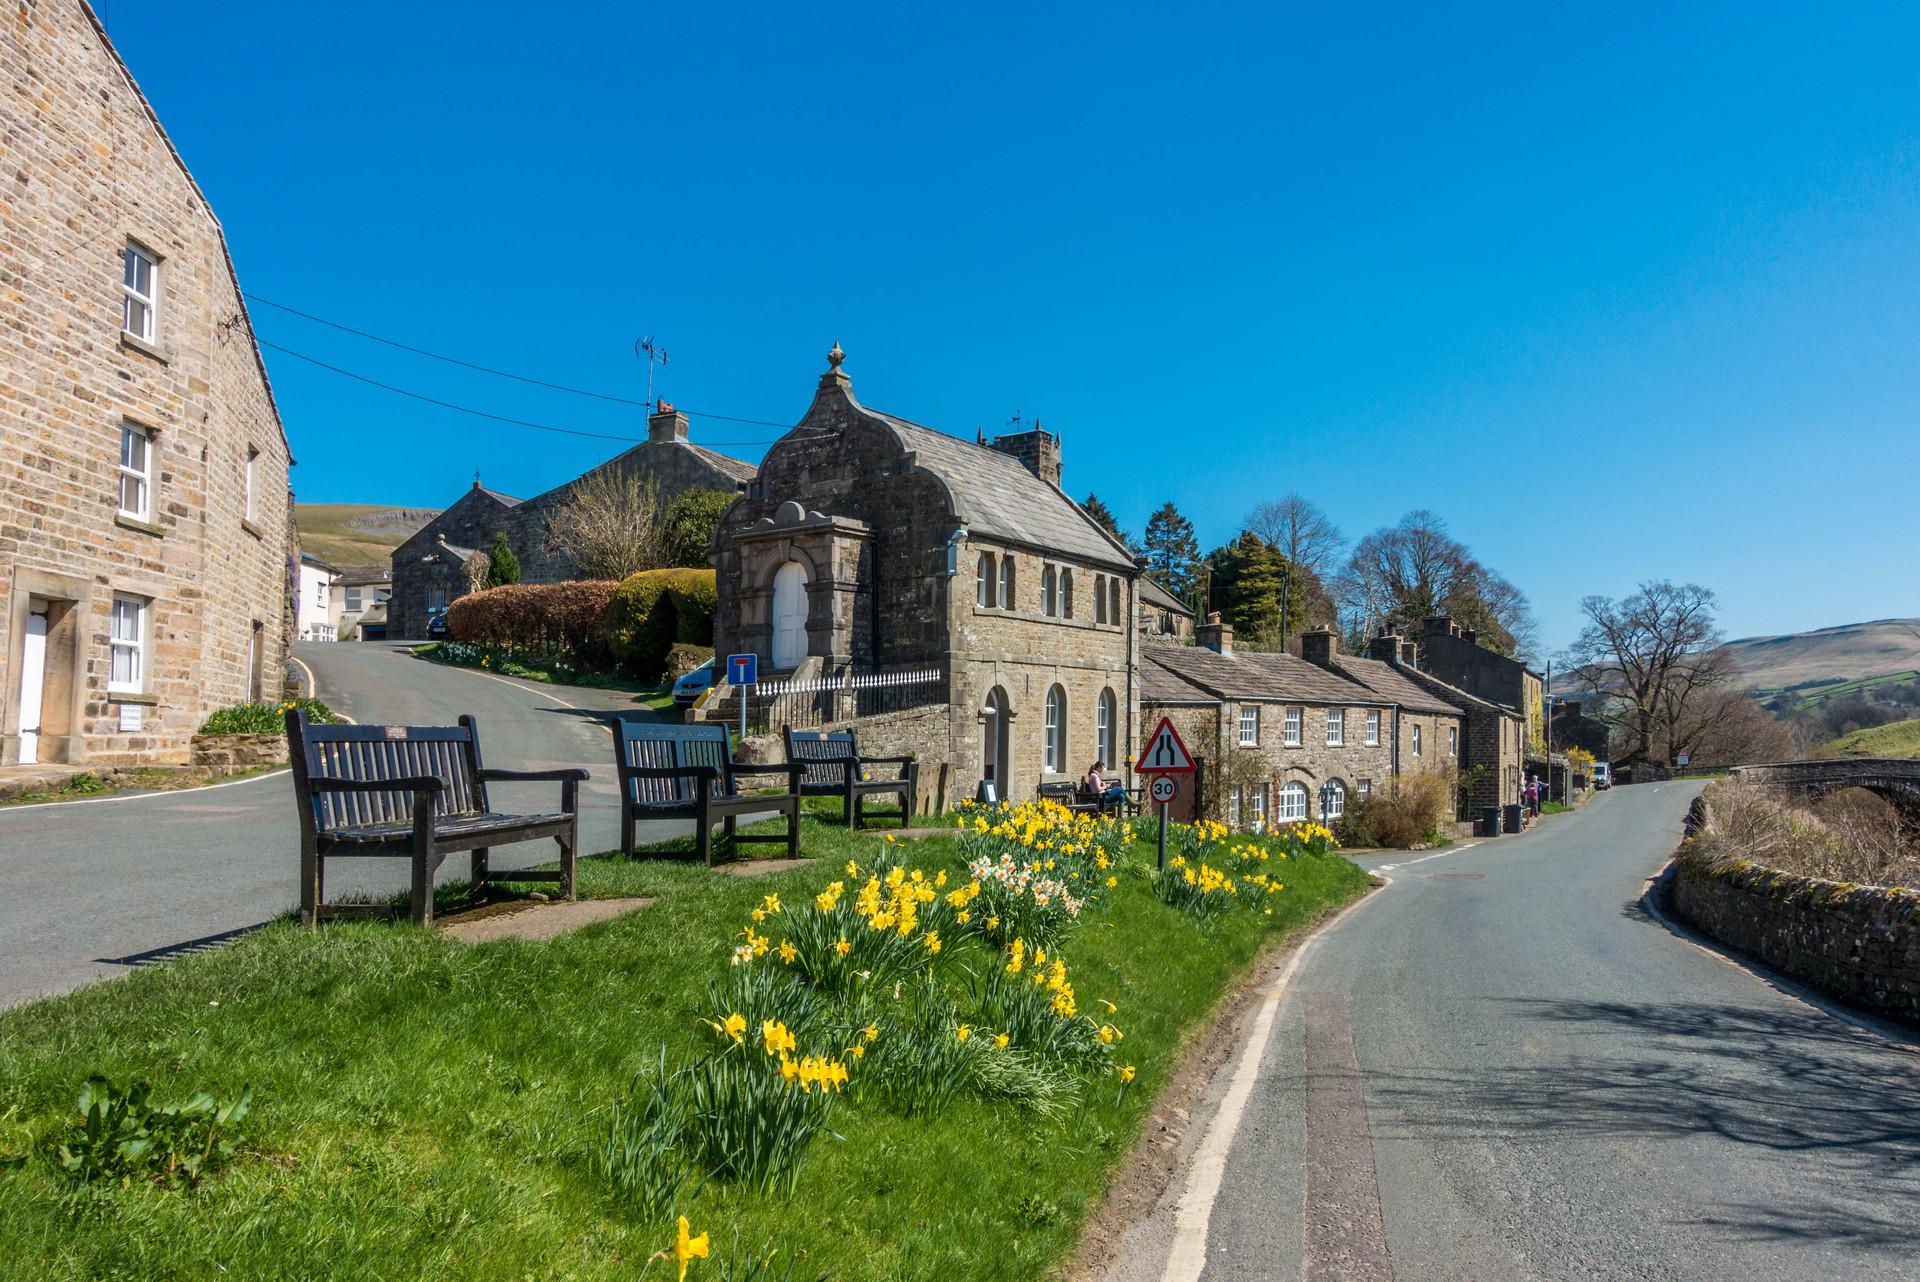 North Yorkshire's delightful Muker village